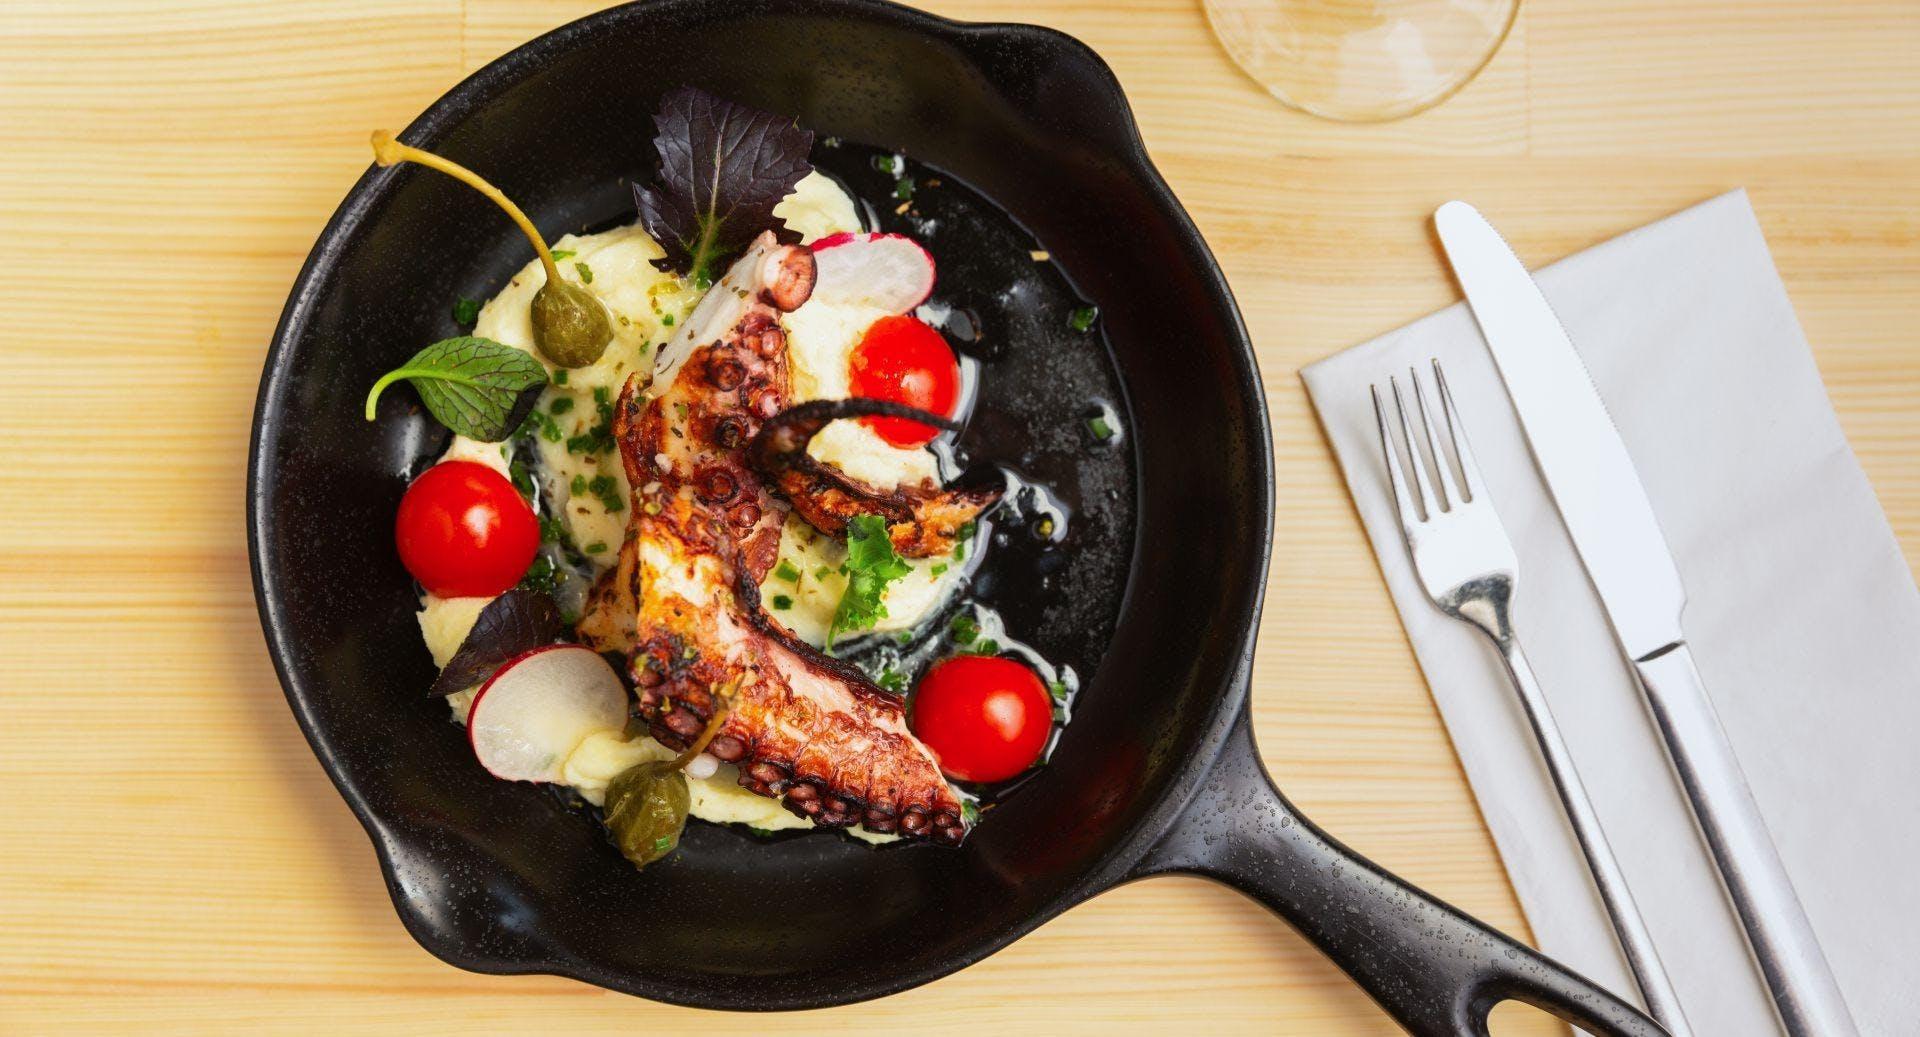 Kouzina Greek Streetfood and Wine